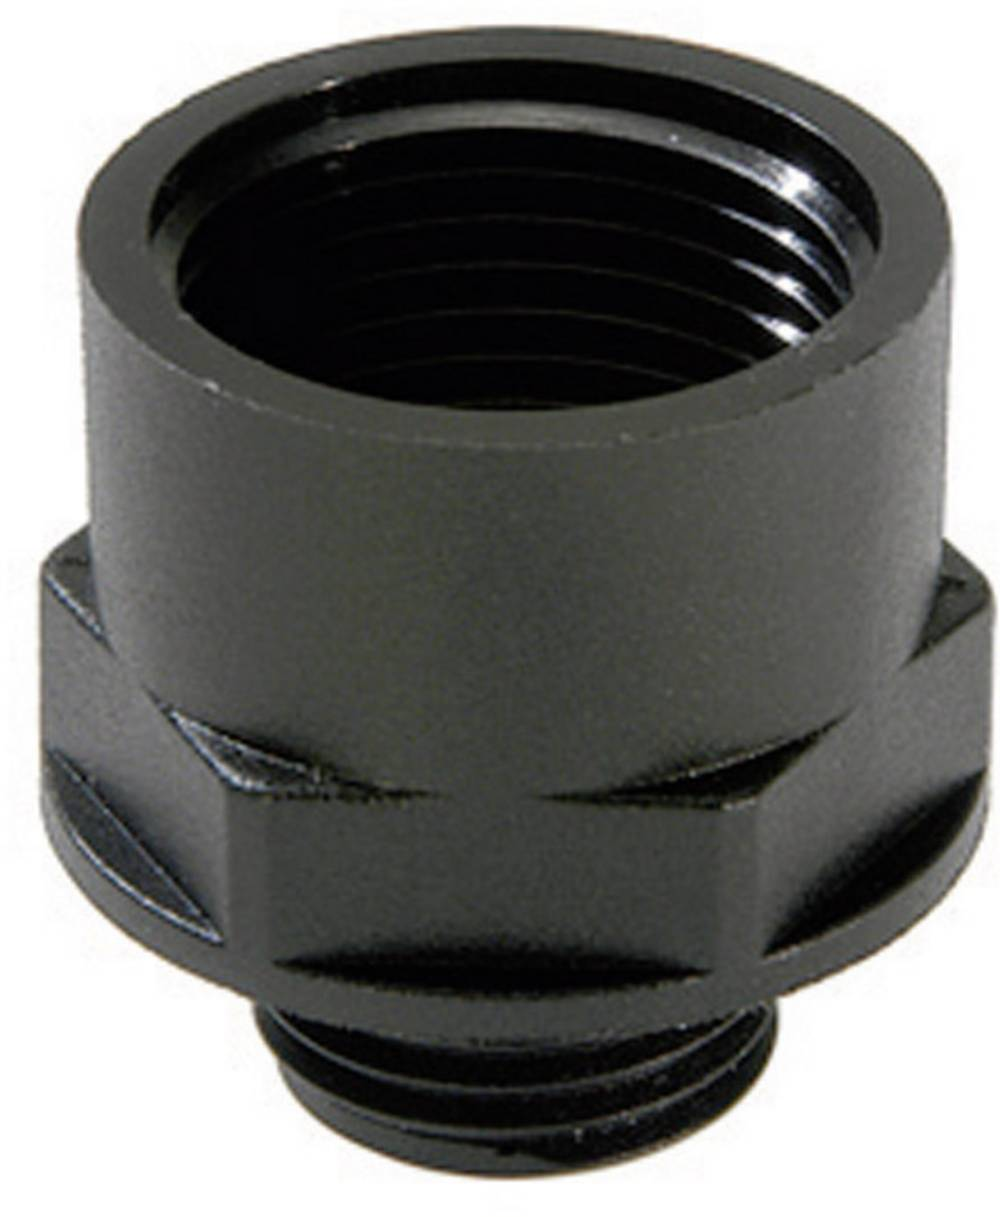 Kabelska uvodnica, produžetak M16 M20, poliamid crne boje (RAL 9005) Wiska ATEX EX-KEM 16/20 1 kom